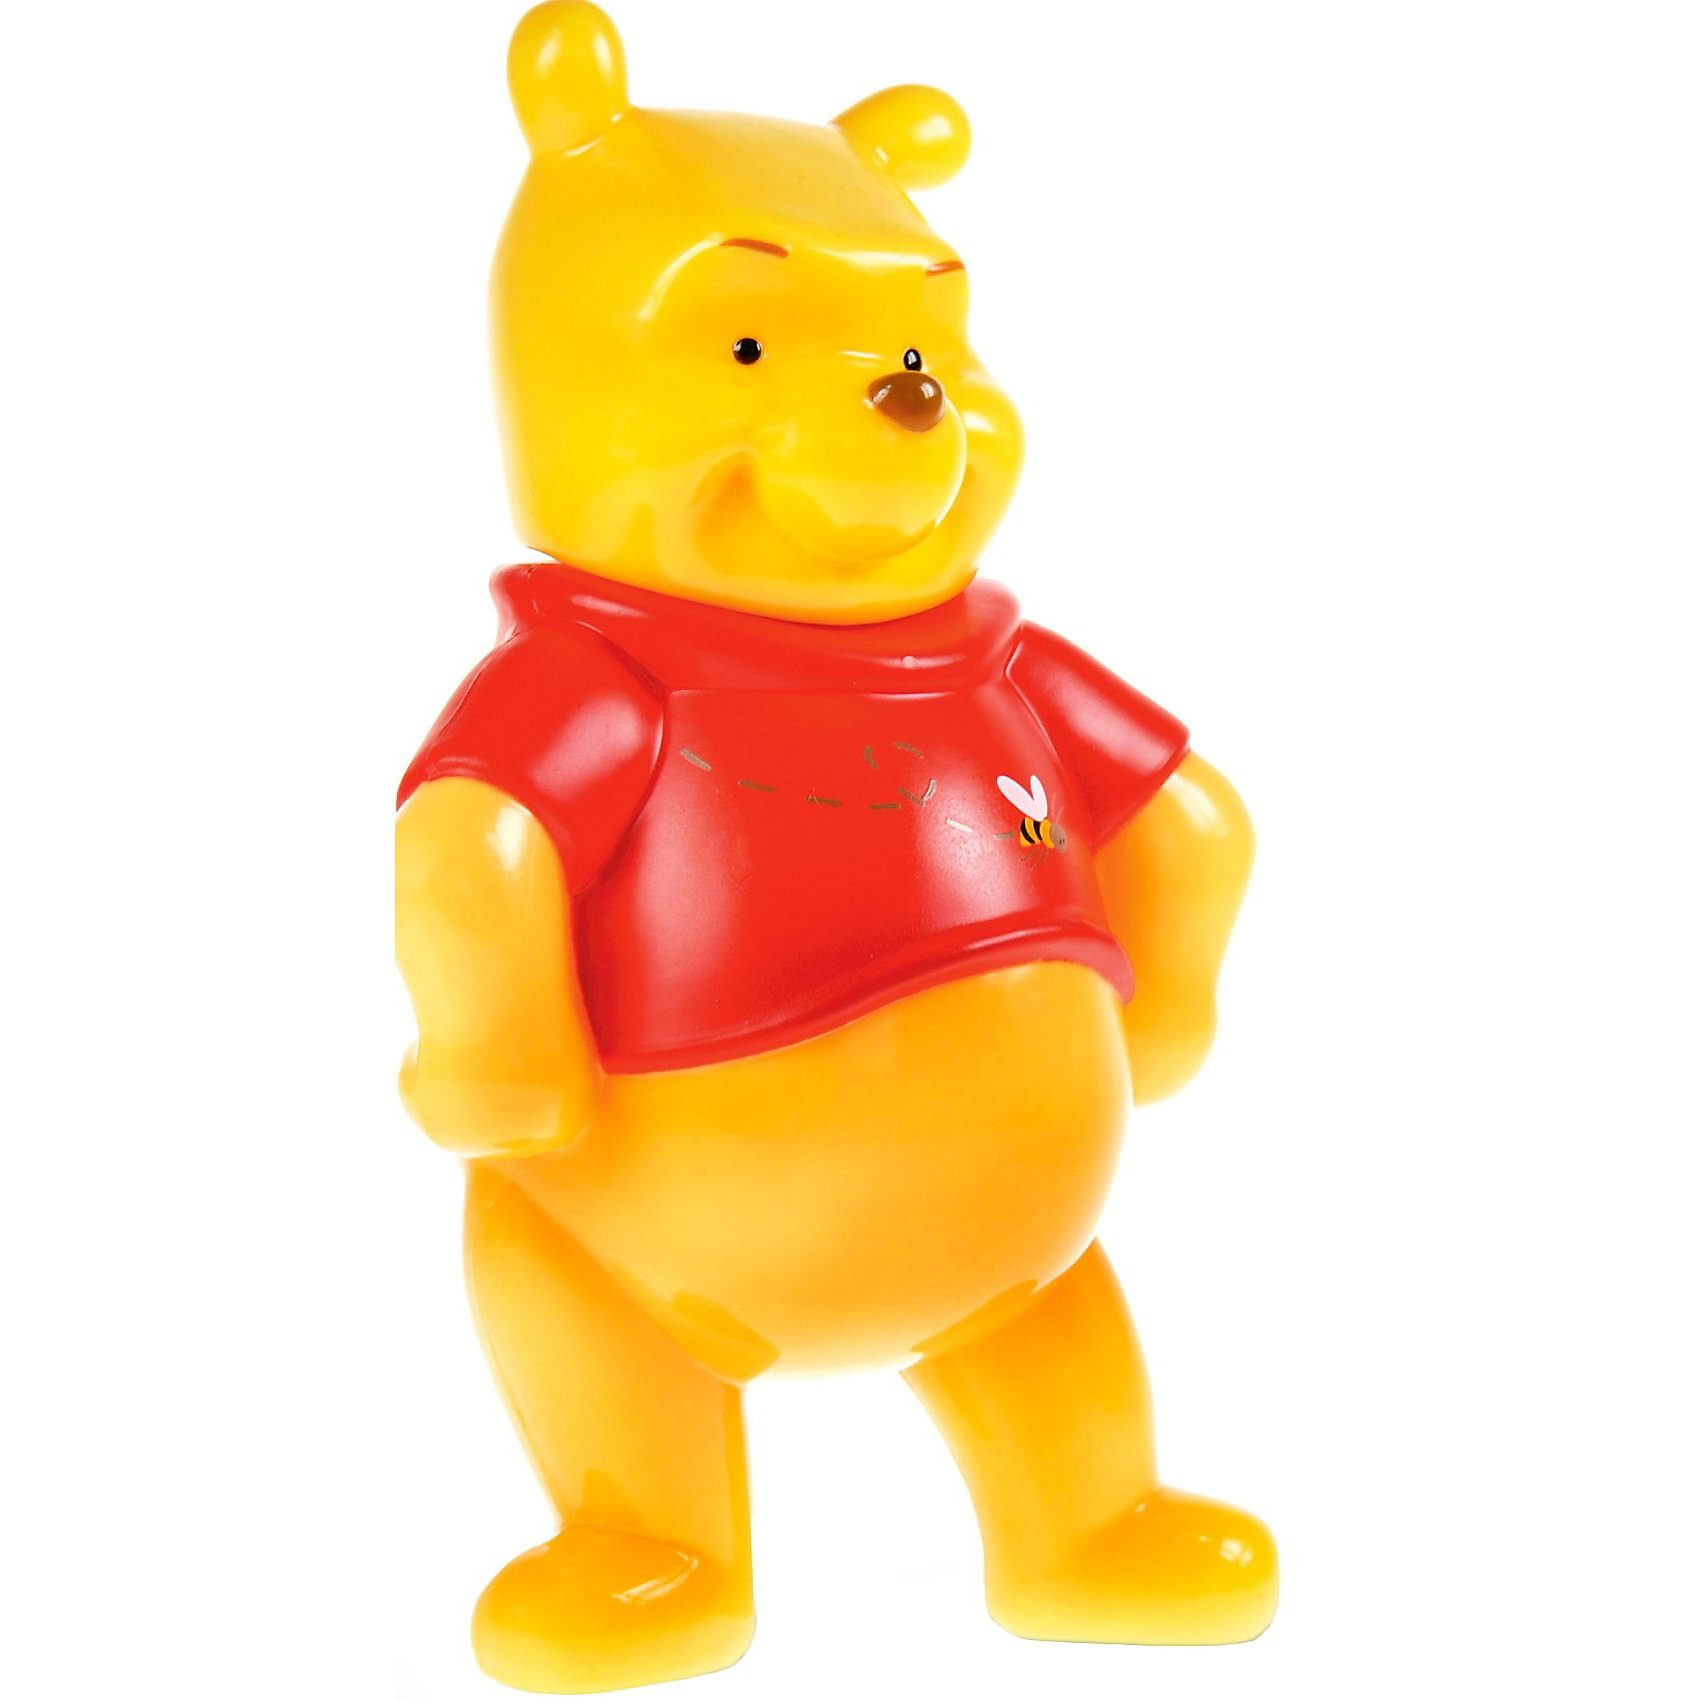 Schaumbadfigur, Winnie Pooh, 300ml